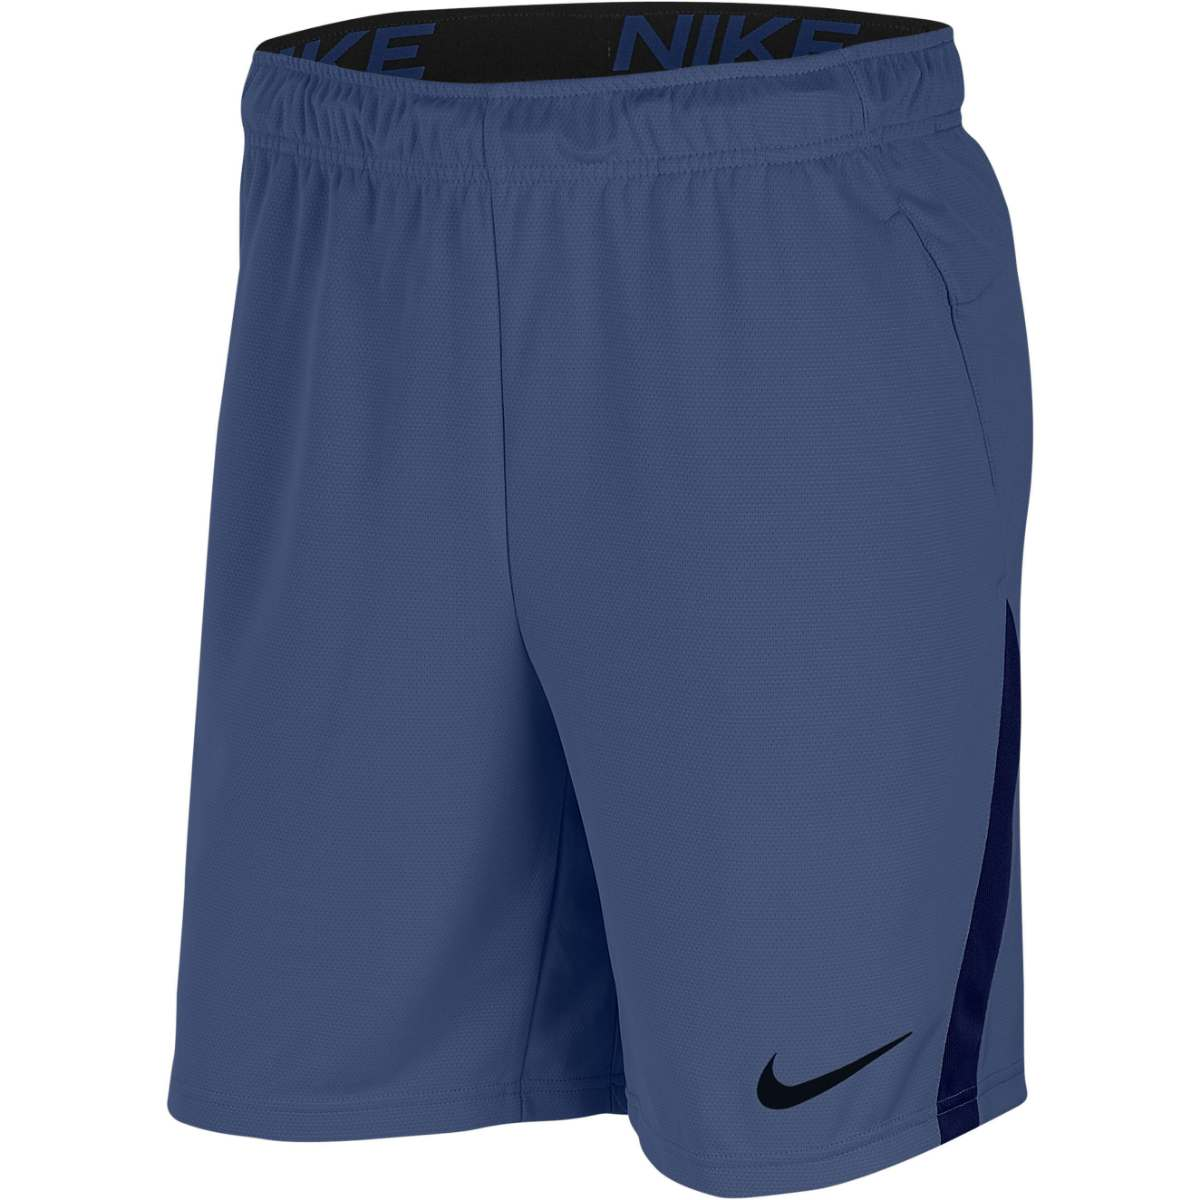 Bermuda Nike Dry 5.0 Masculino  - Ferron Sport